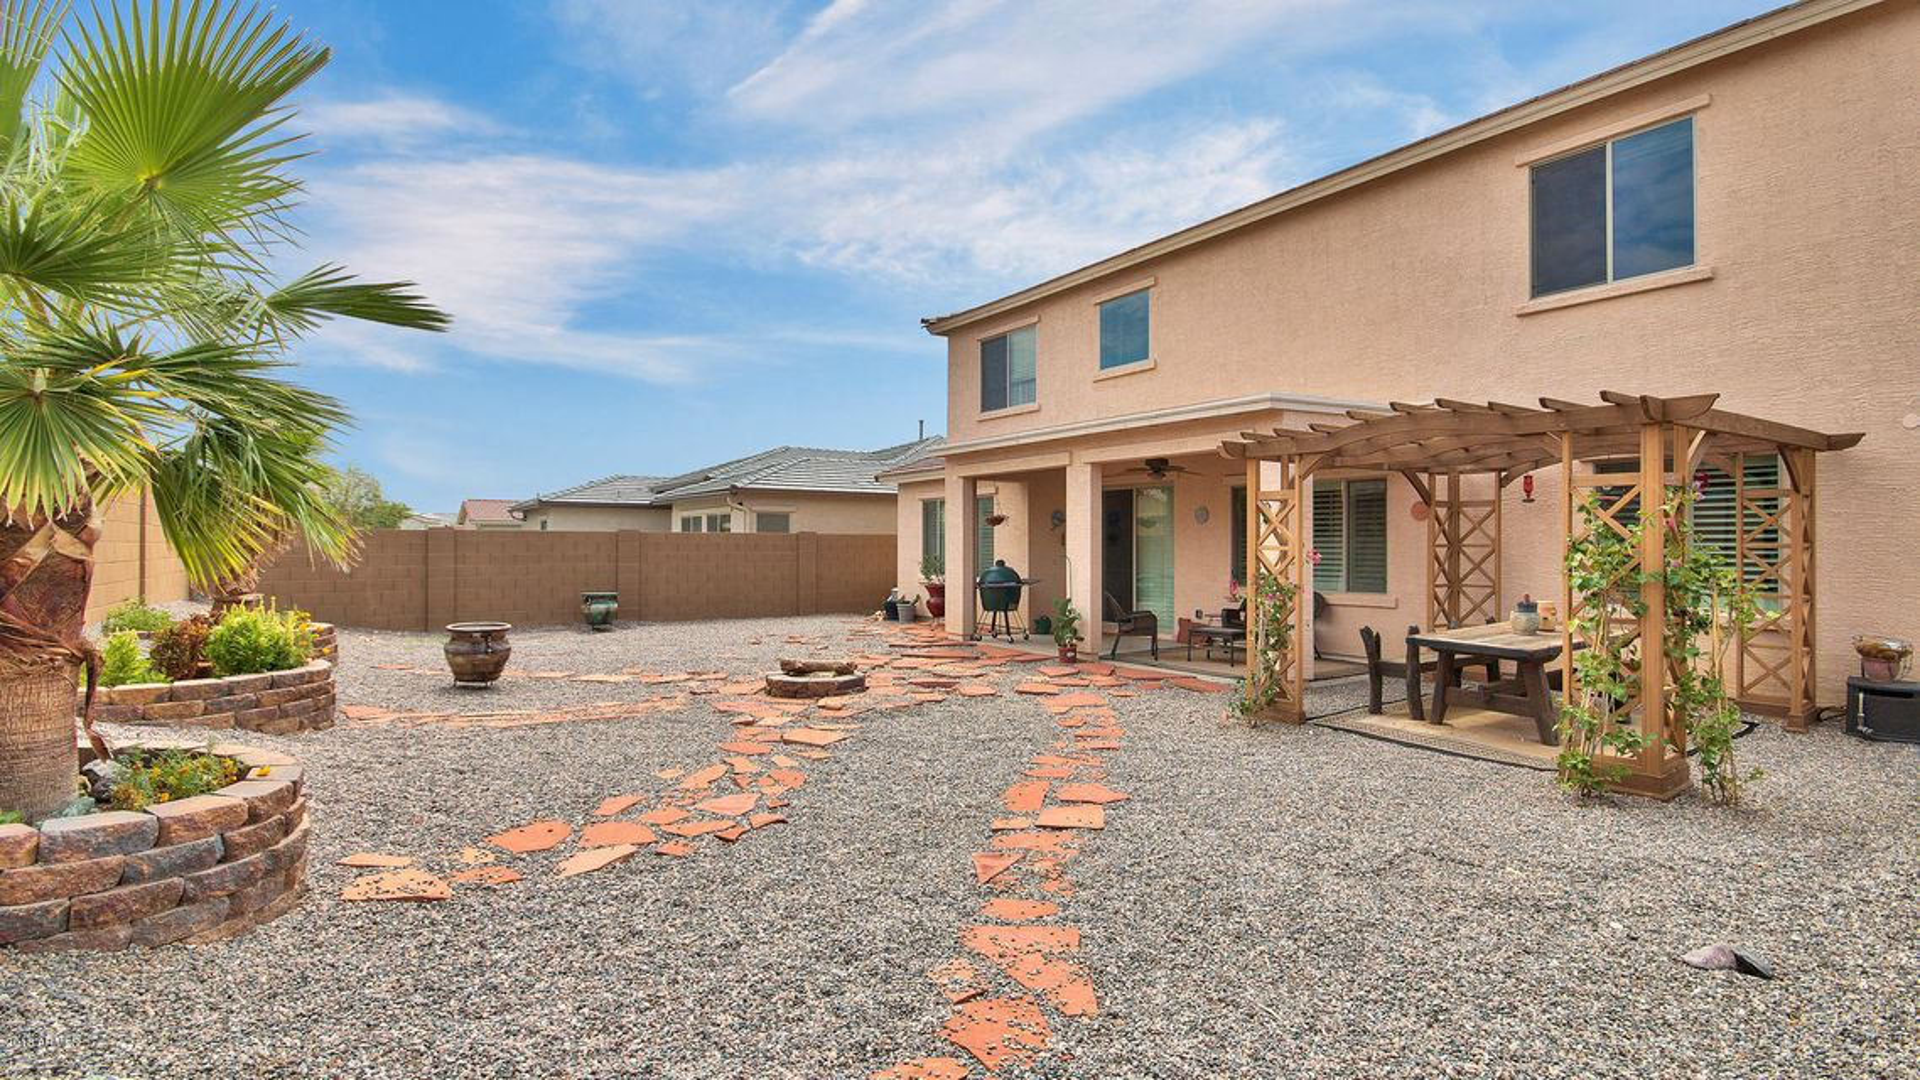 MLS 5801506 18630 W MOUNTAIN VIEW Road, Waddell, AZ 85355 Waddell AZ Two-Story